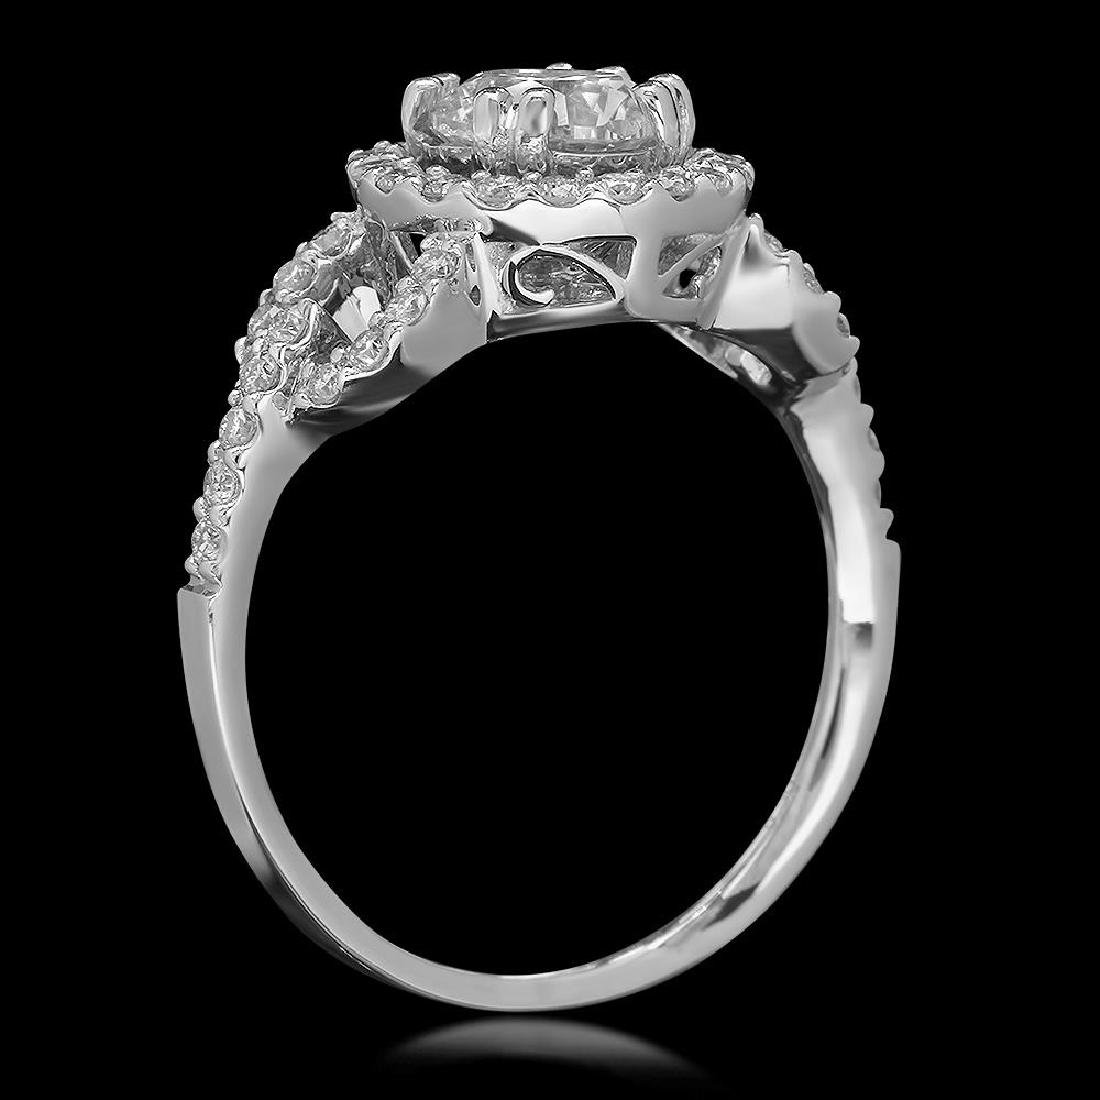 14K Gold 1.44ct Diamond Ring - 2